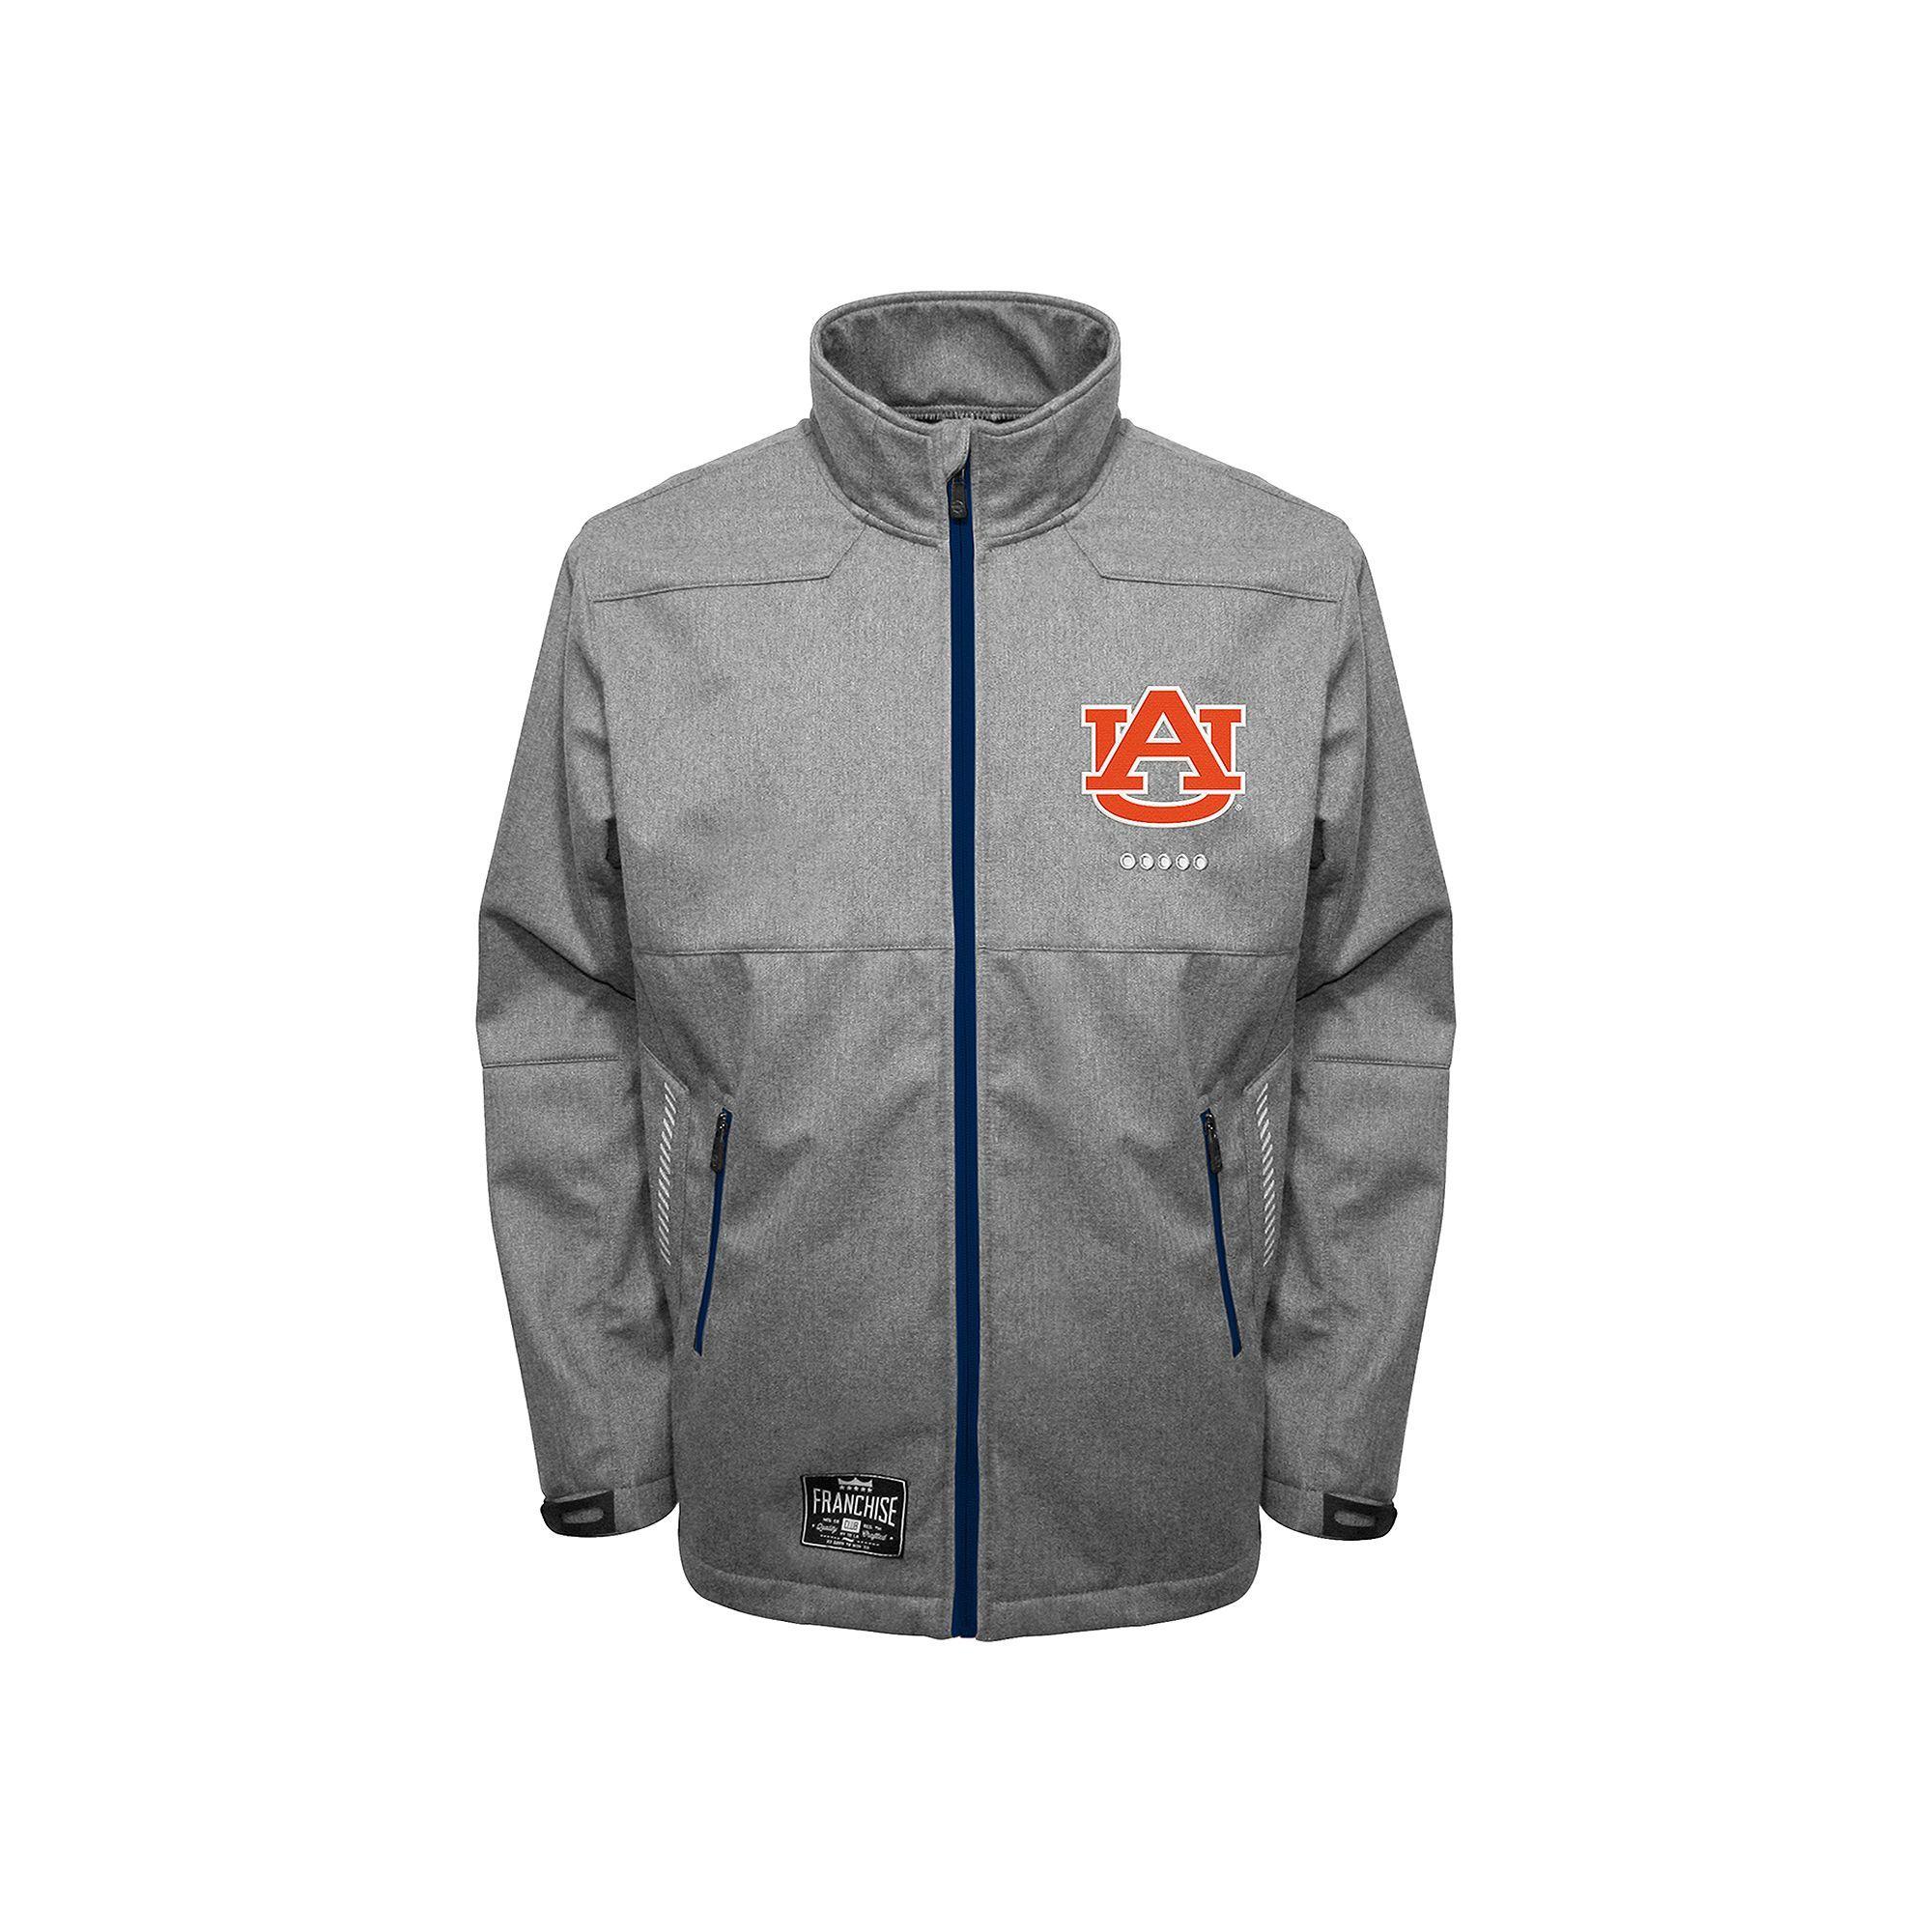 Men's Franchise Club Auburn Tigers Tech Fleece Softshell Jacket, Size: Large, Grey